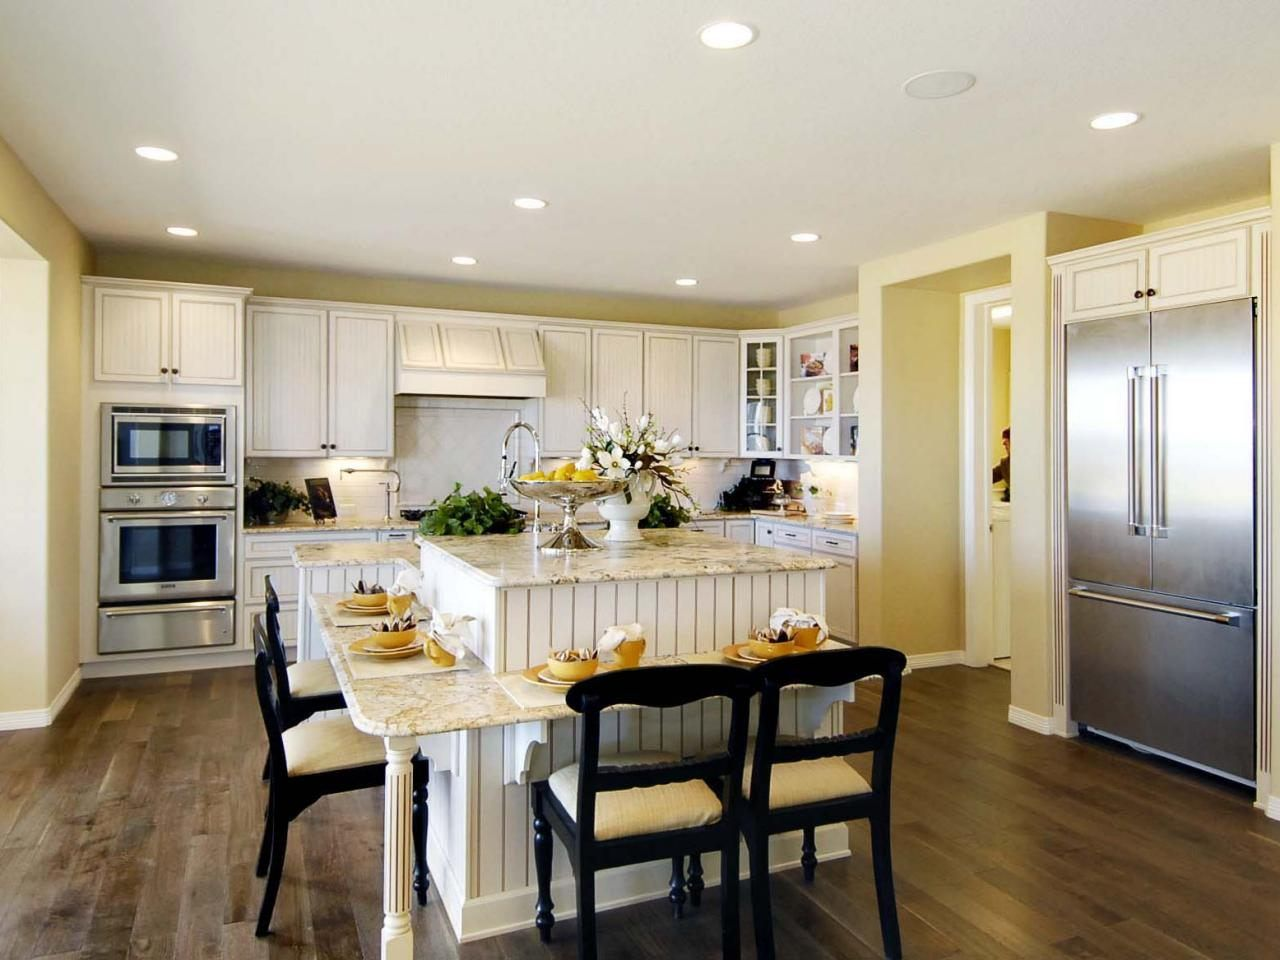 Image Result For T Shape Kitchen Island  Cottage Ideas Extraordinary Kitchen Island Designs Plans Design Decoration